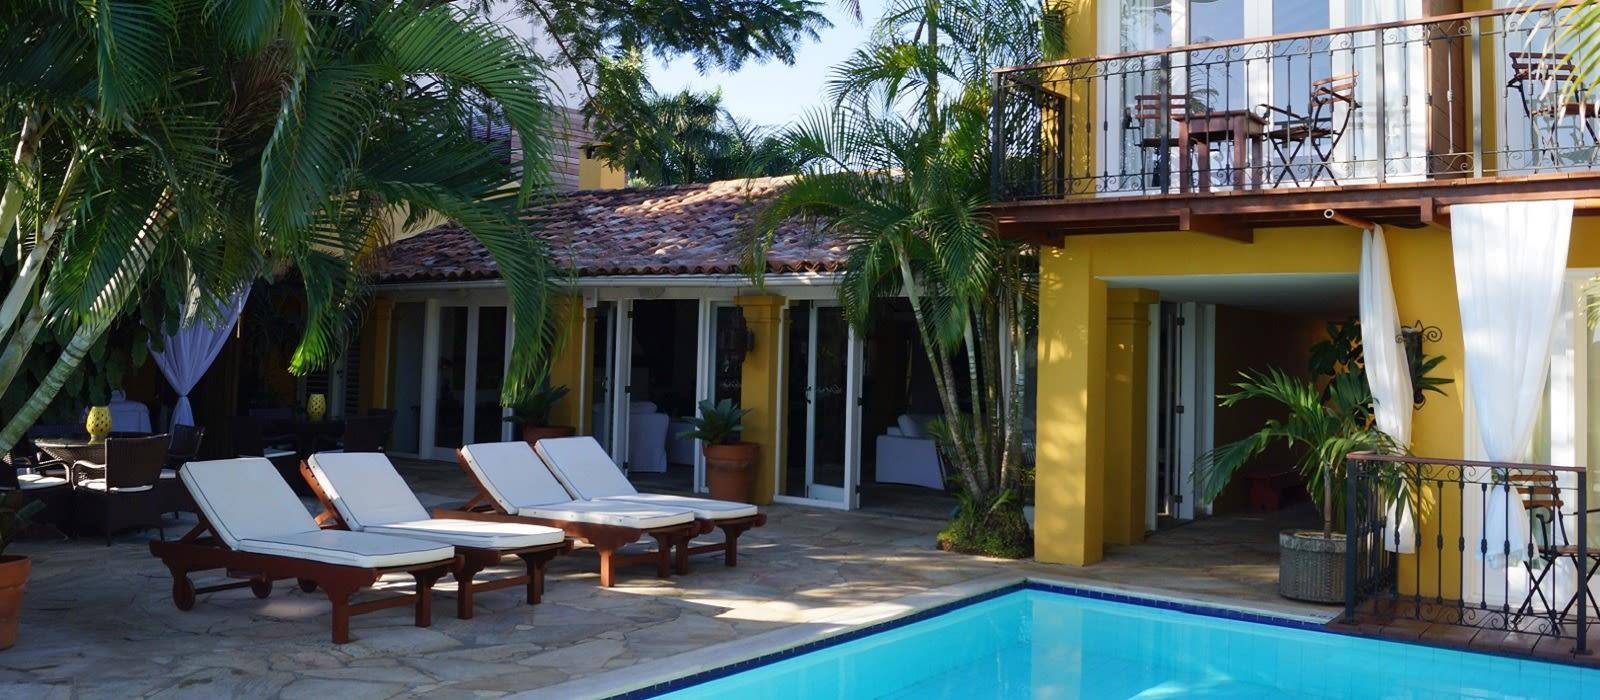 Hotel Villa d'Este Brasilien